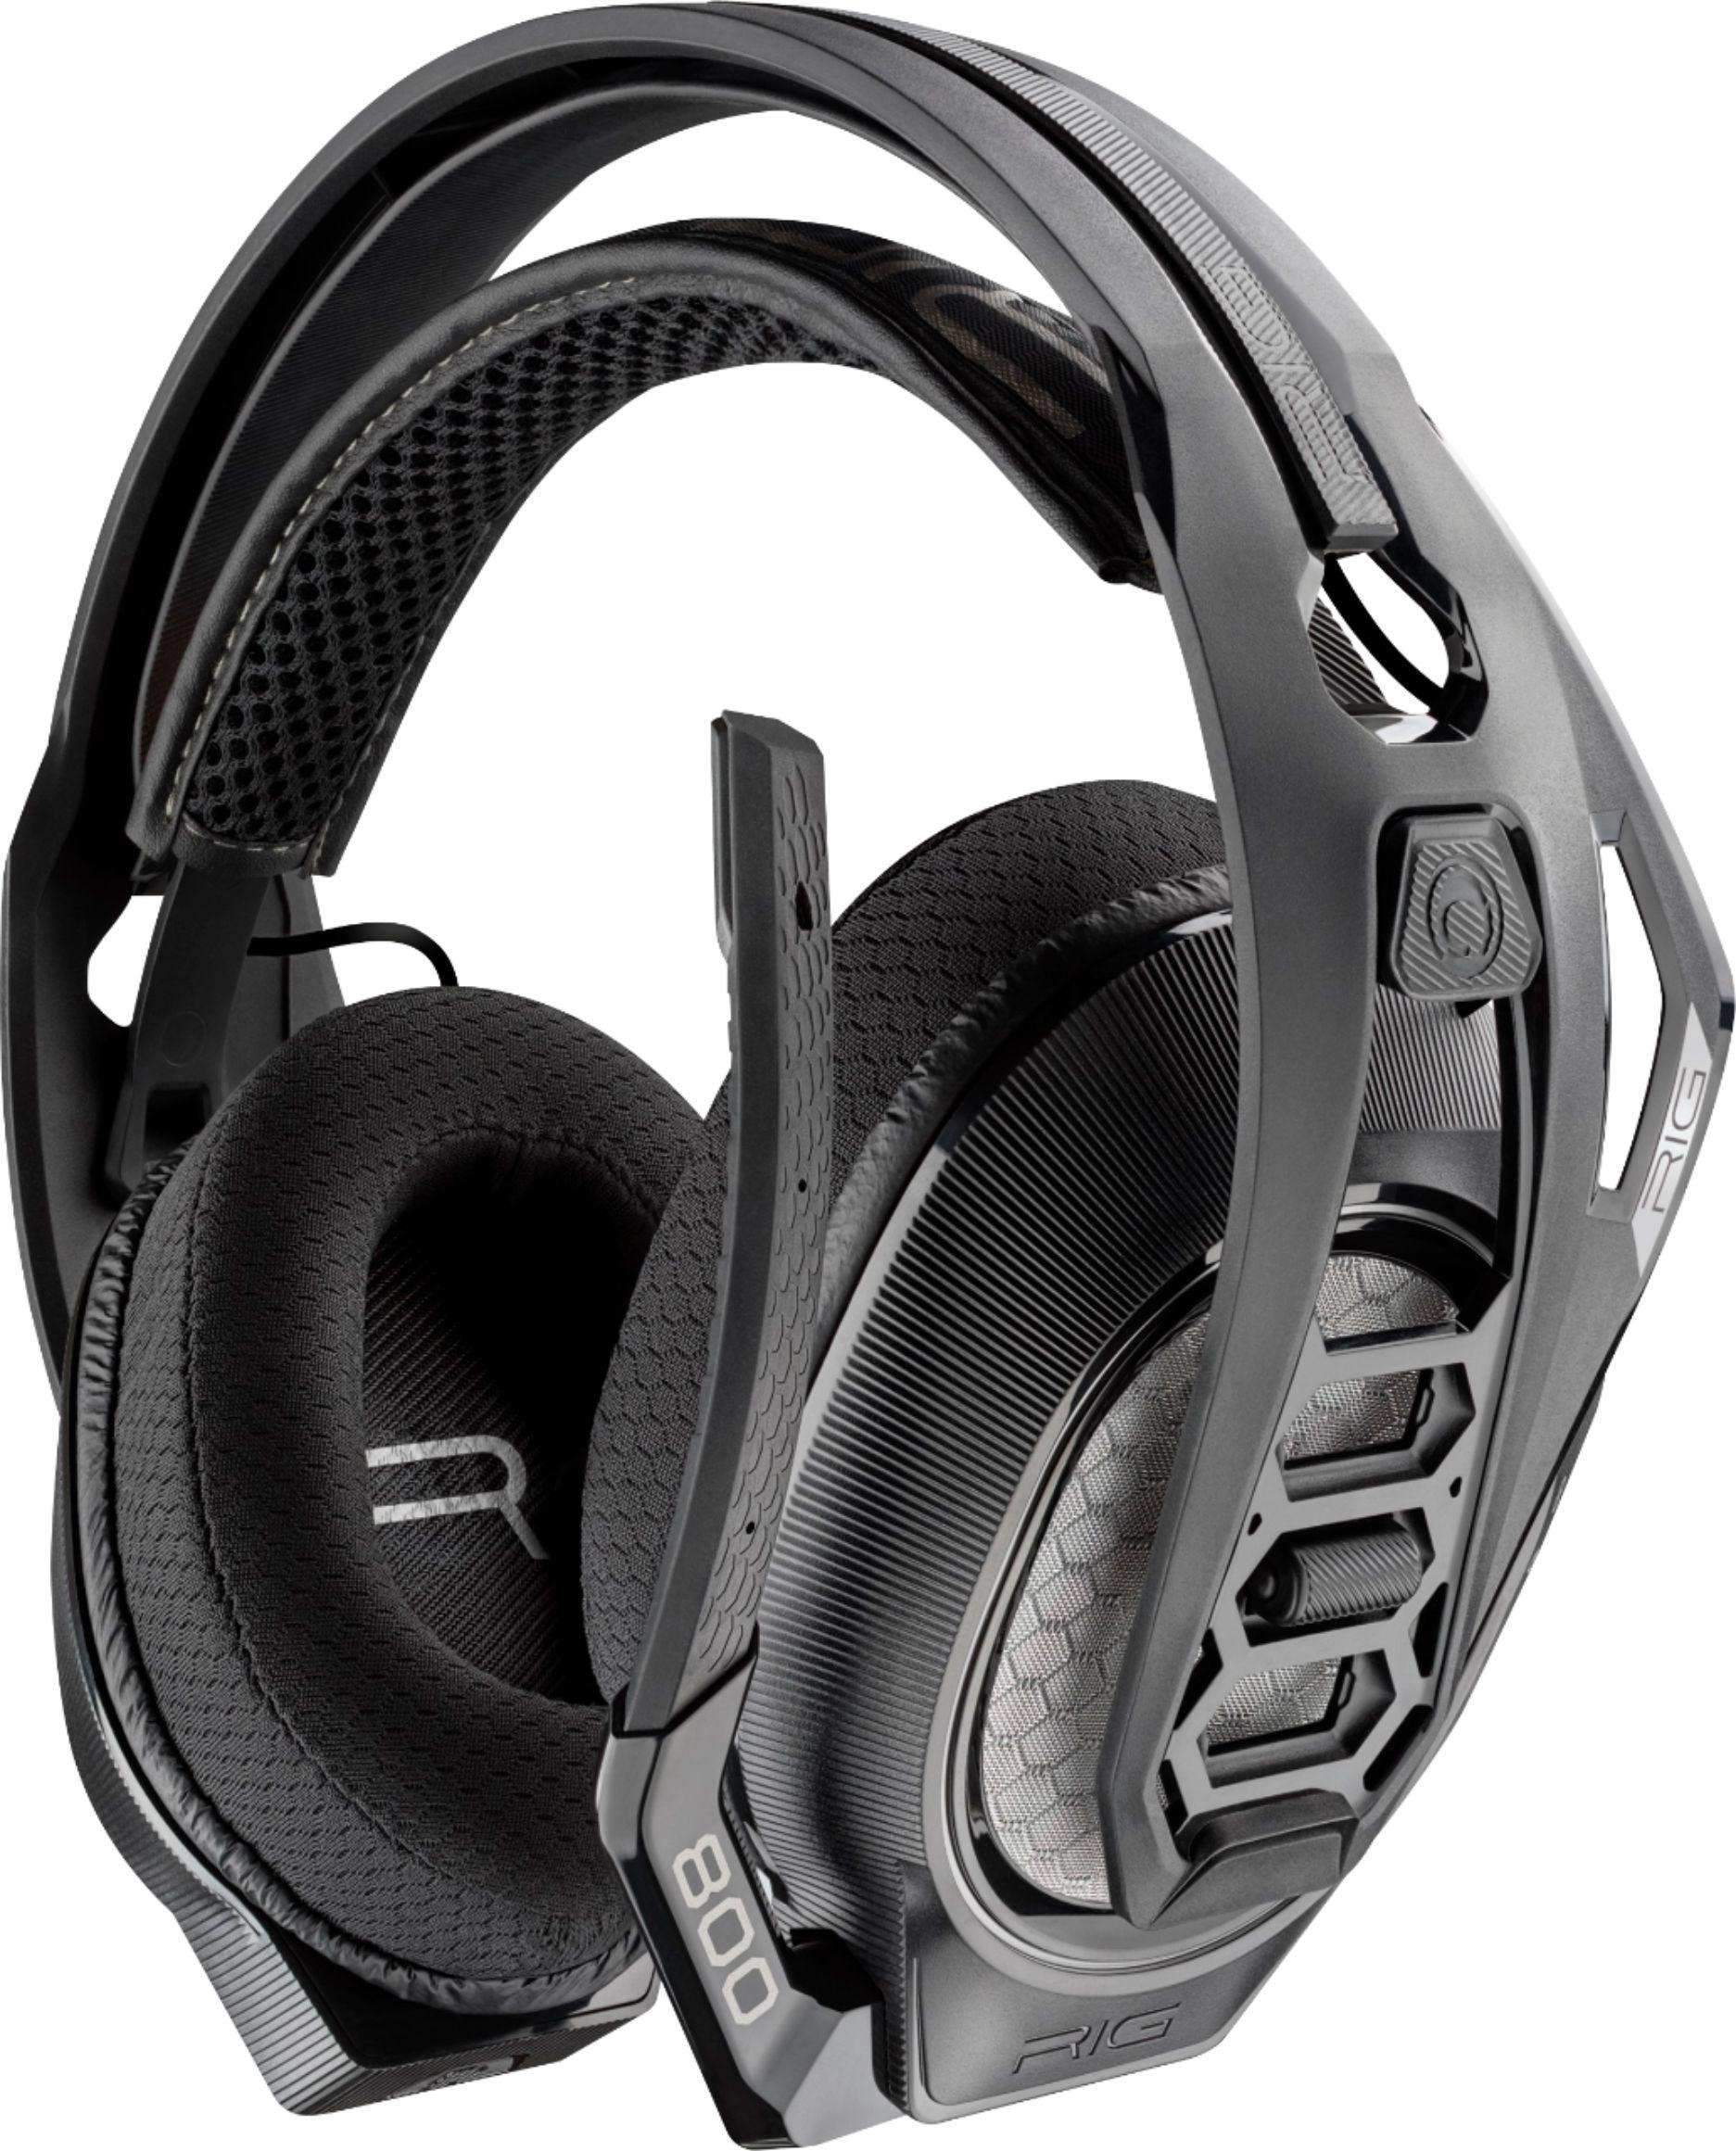 Plantronics – RIG 800LX Wireless Headset for Xbox One – Black